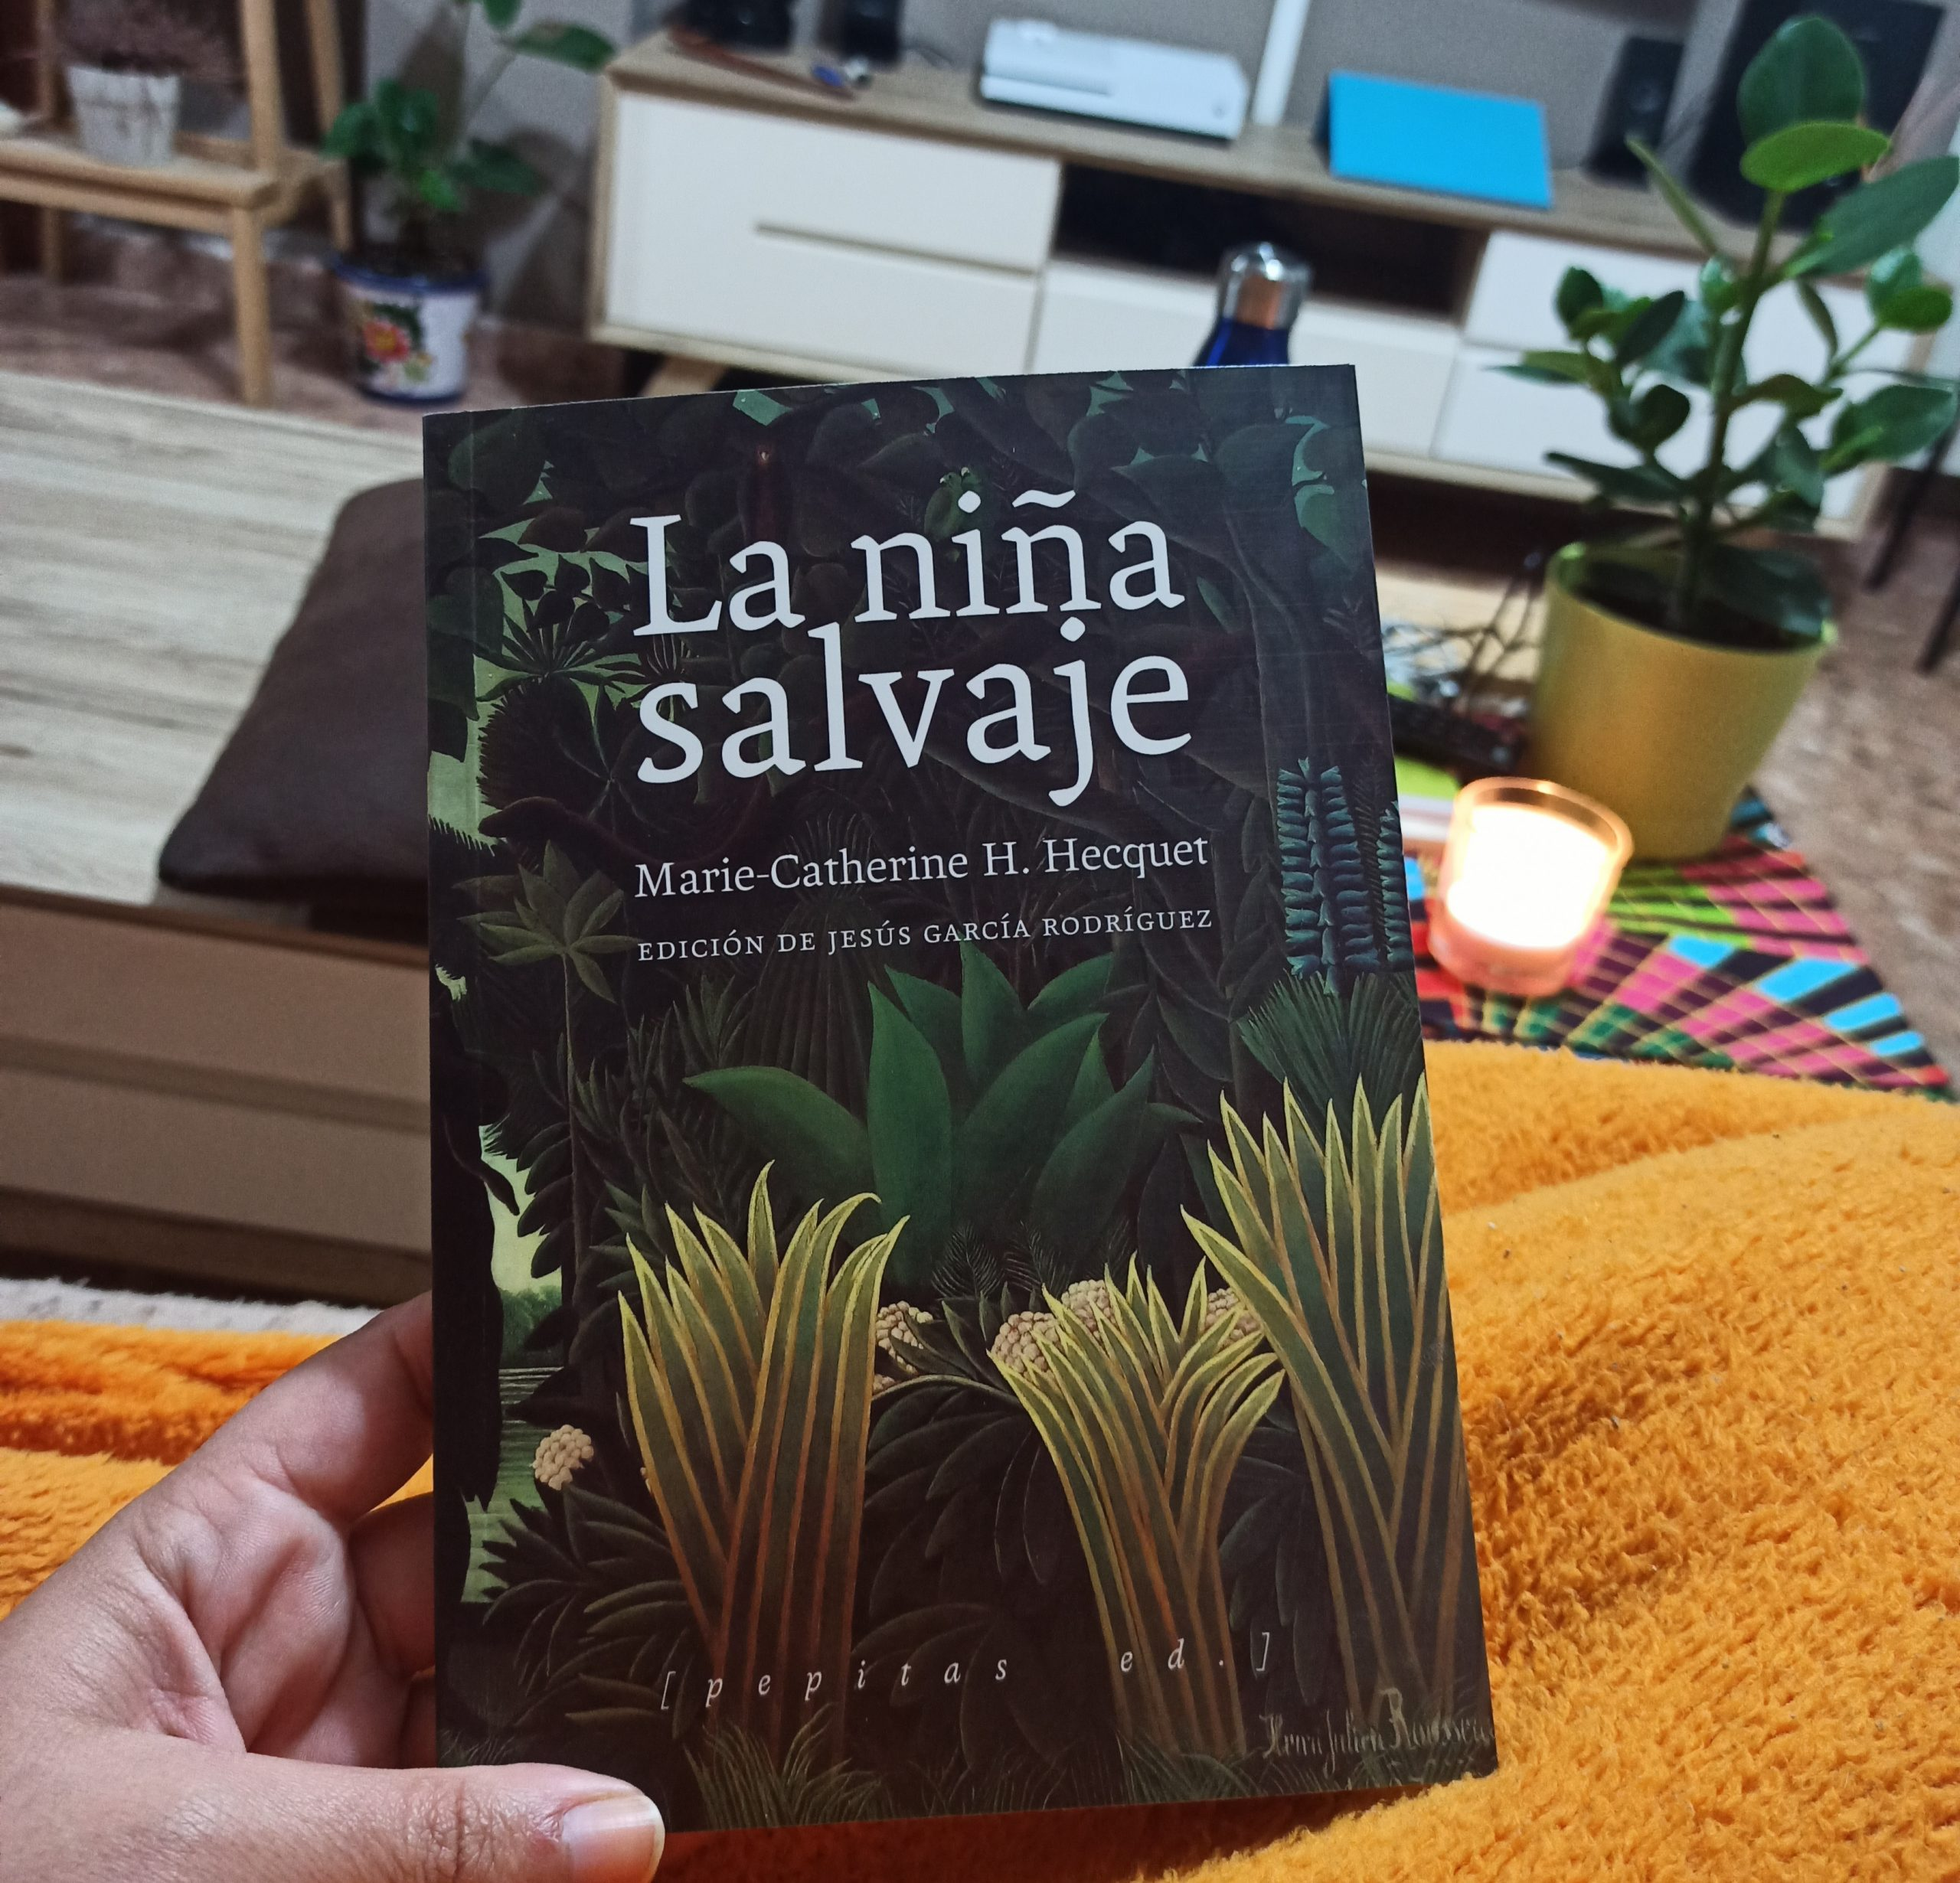 LA NIÑA SALVAJE, de Marie Catherine H. Hecquet